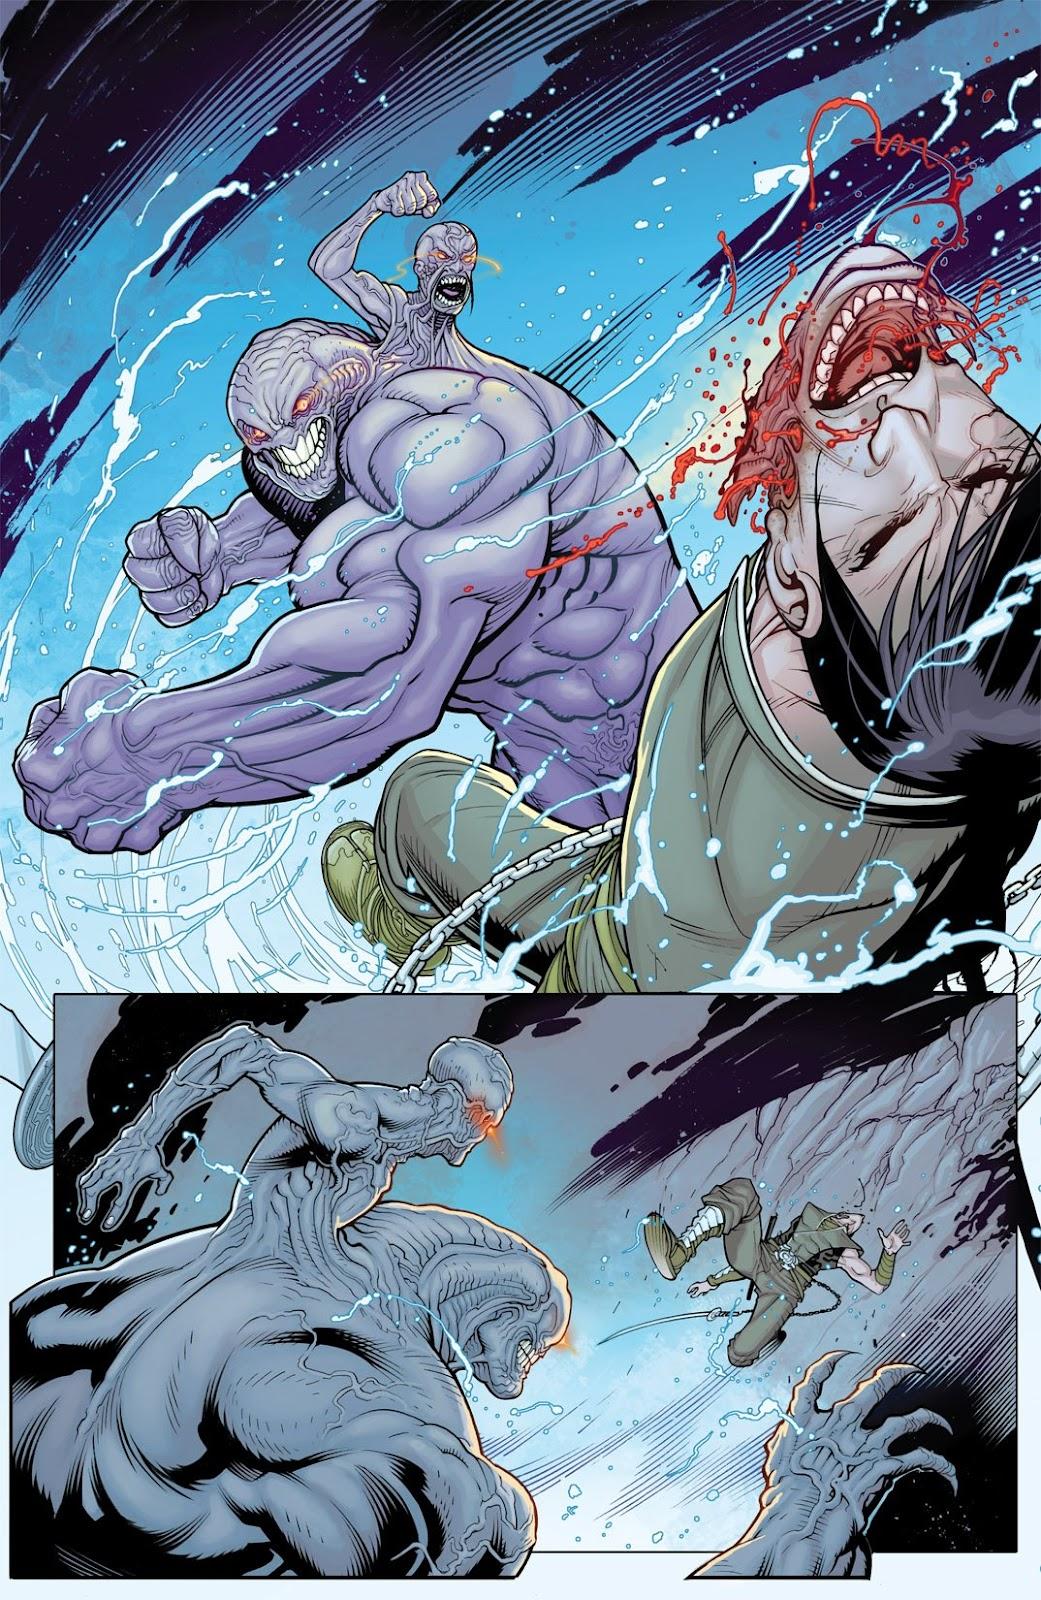 Read online Reaper comic -  Issue #2 - 37